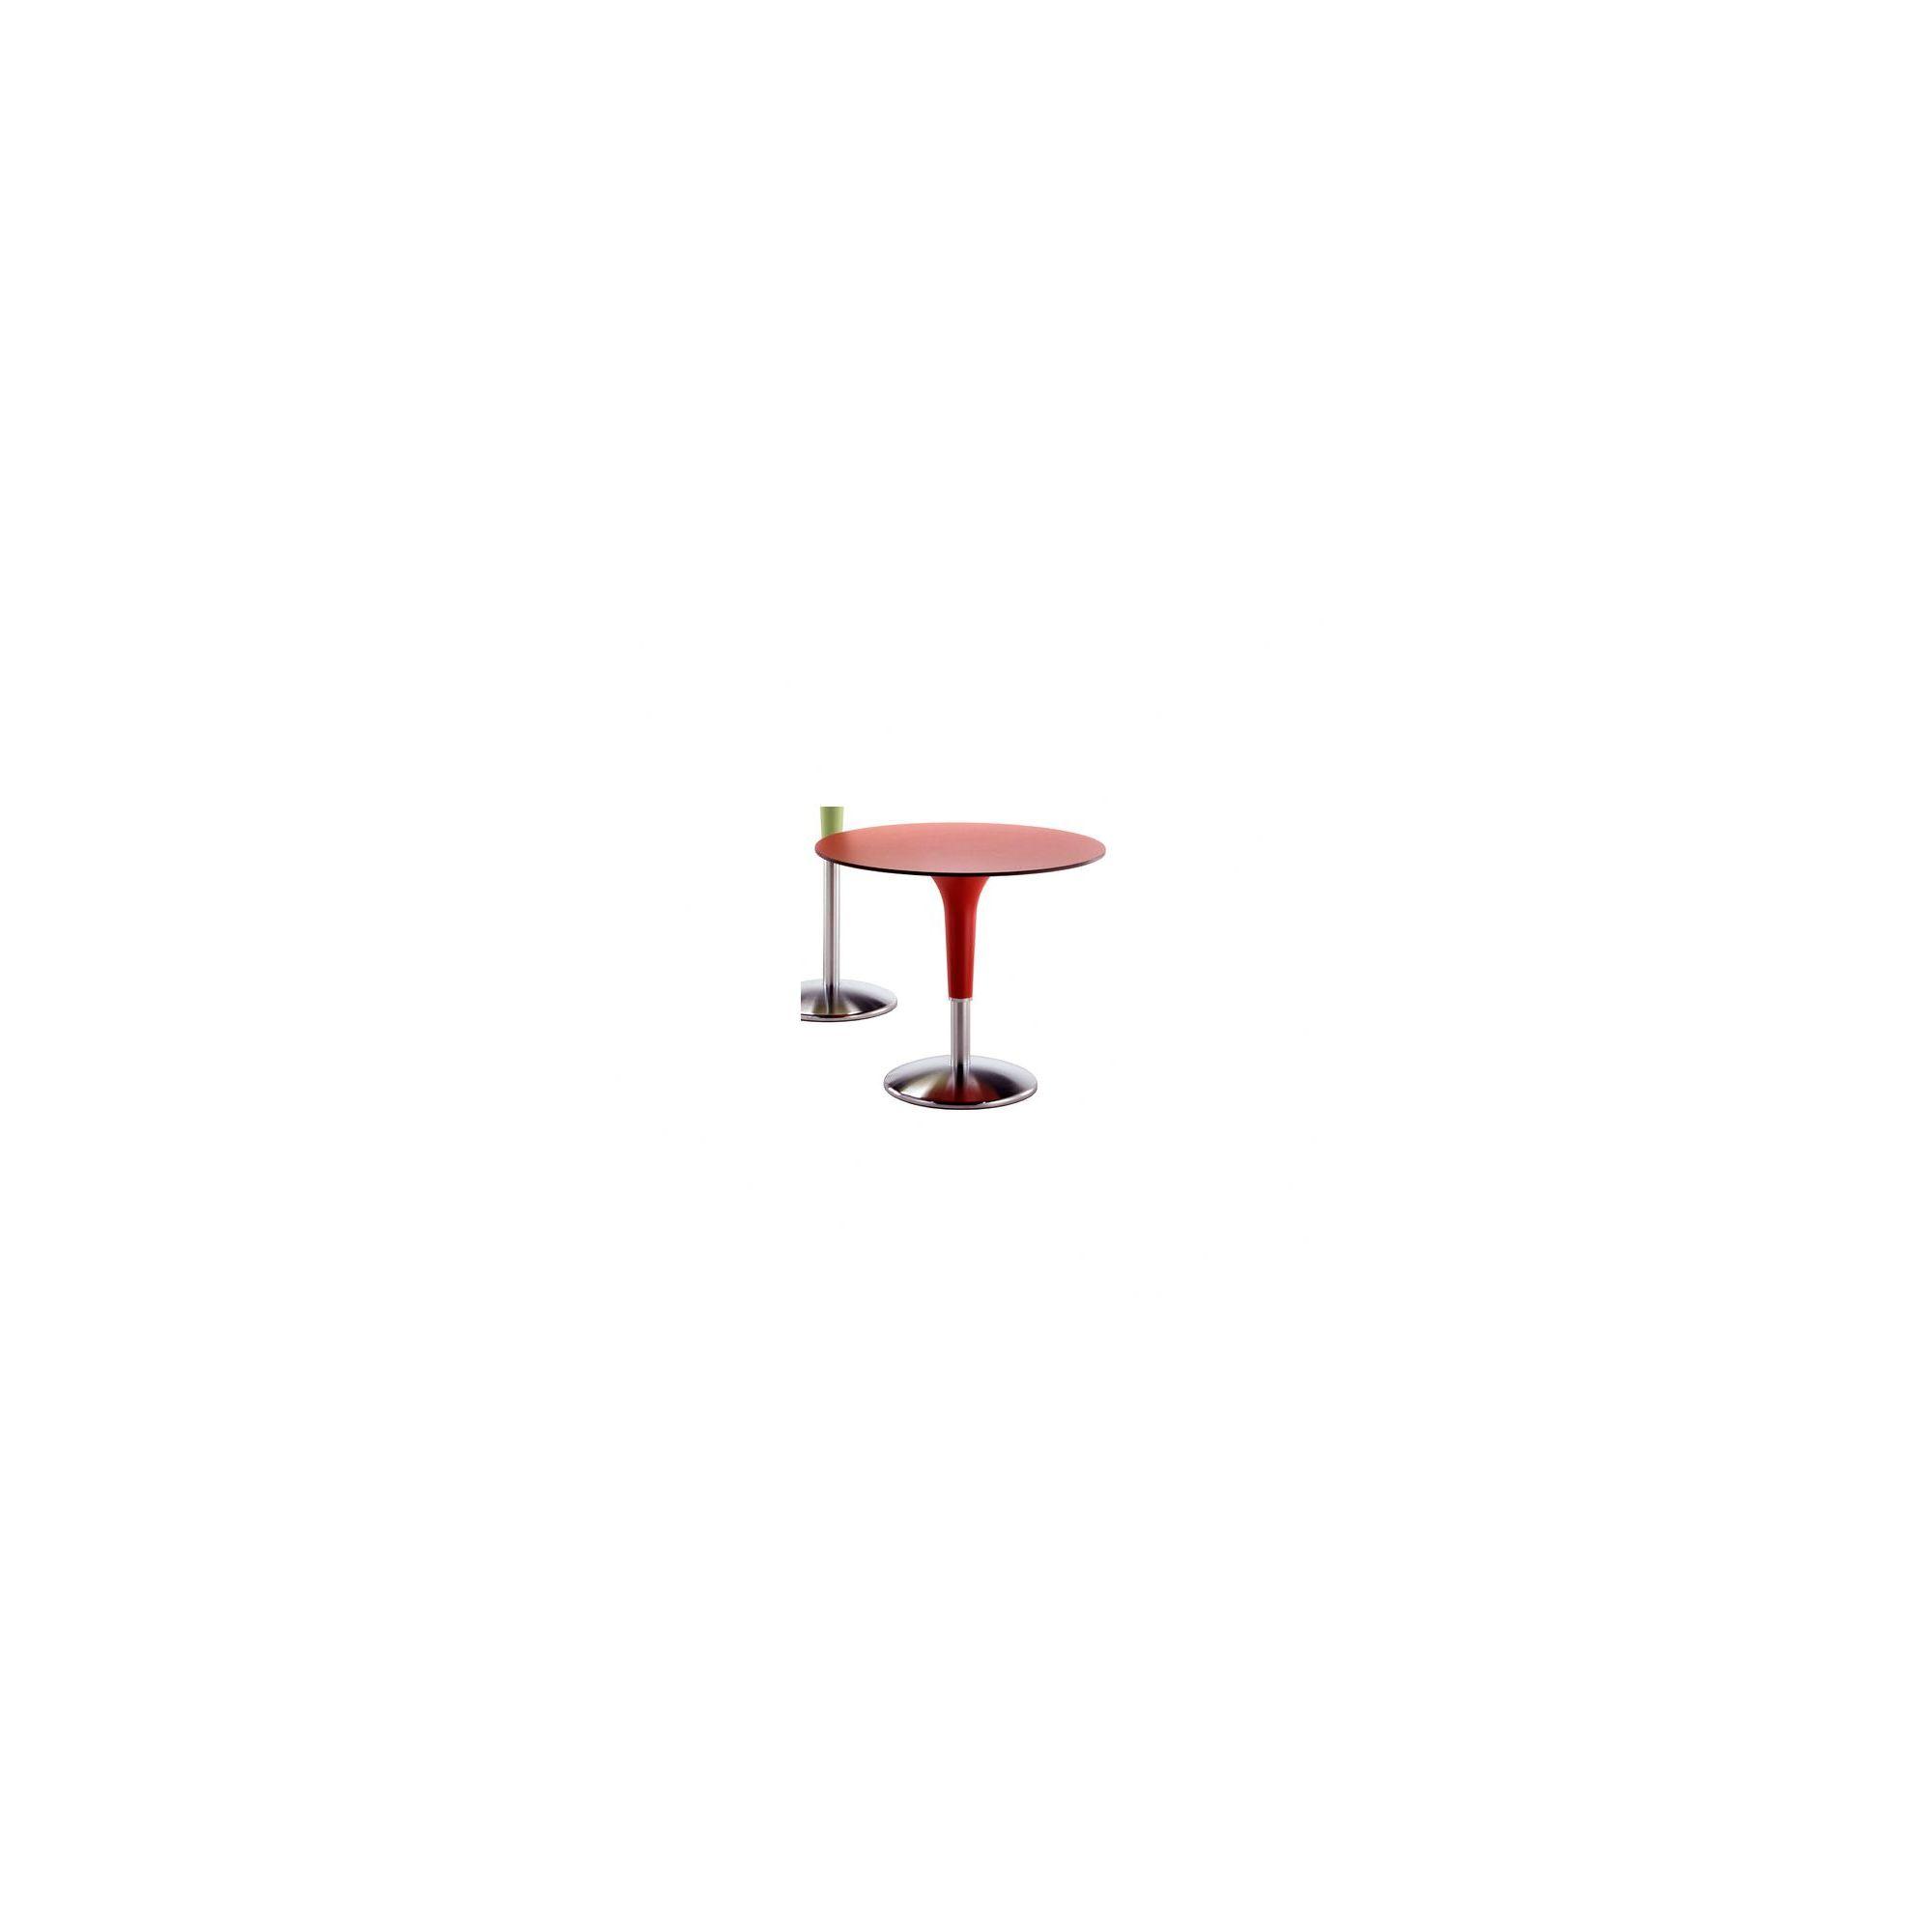 Rexite Zanziplano Round Coffee Table - 60cm x 75cm - Grey at Tesco Direct